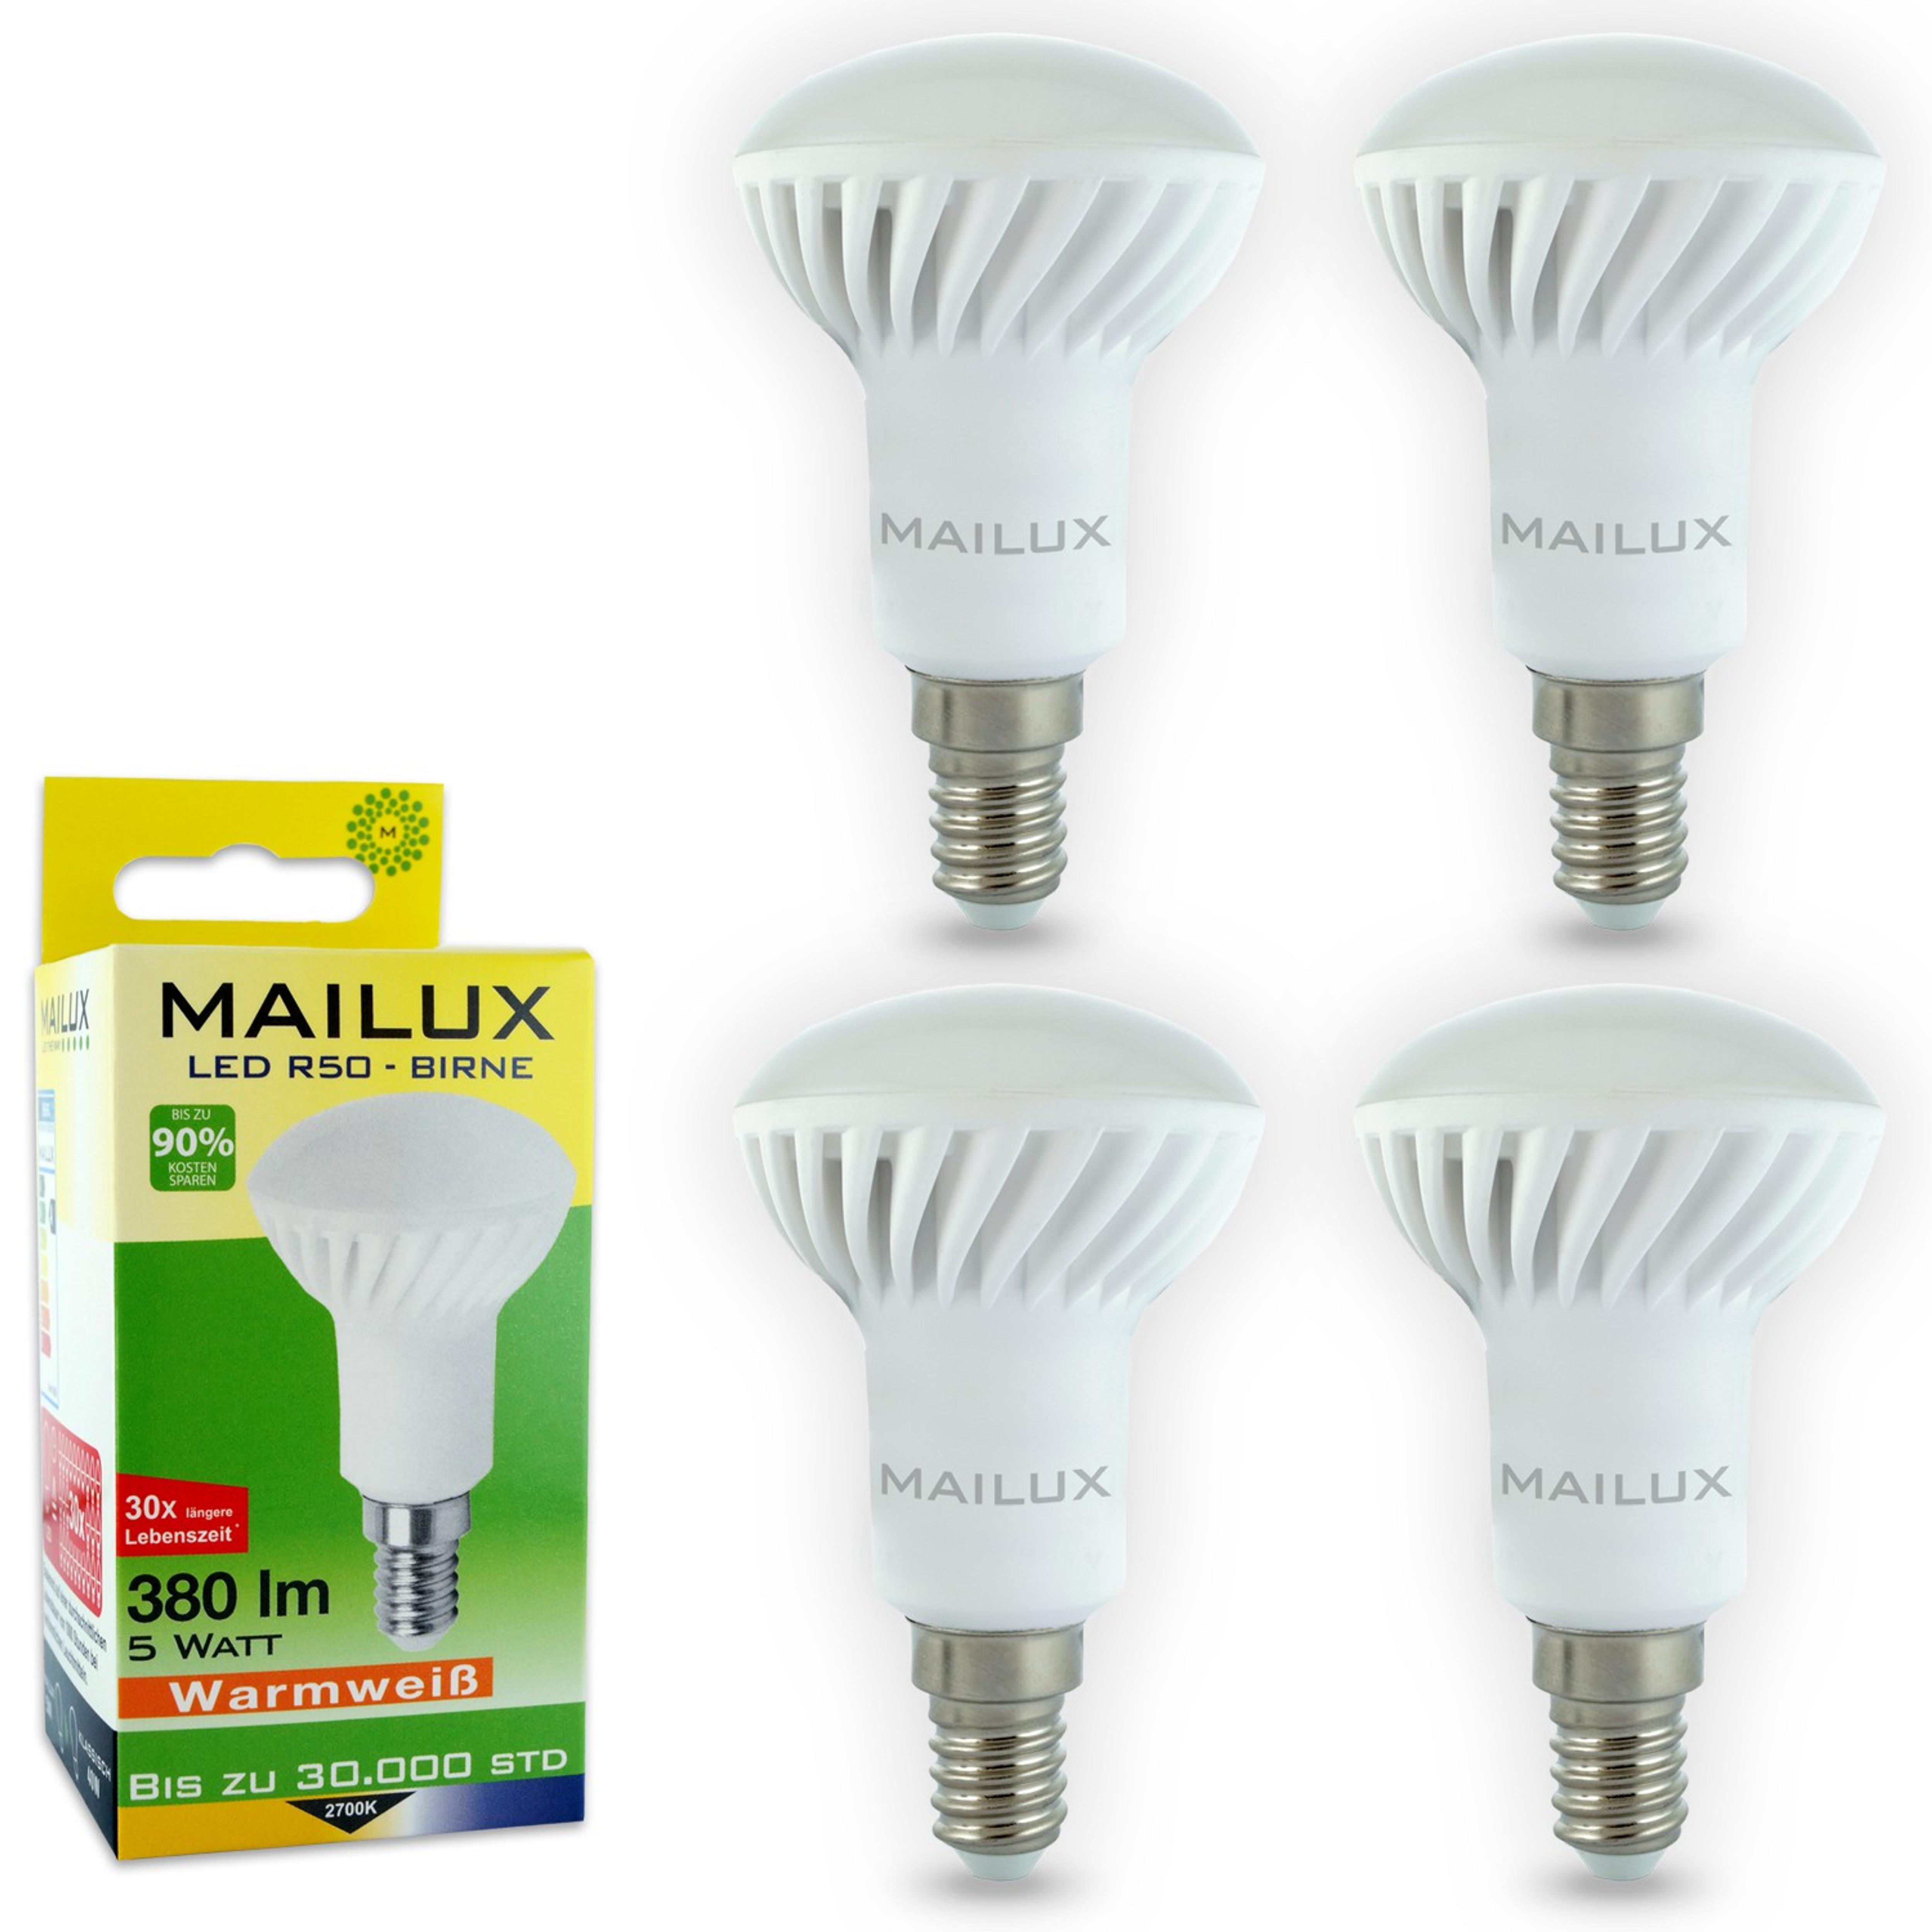 4x MAILUX R50 E14 5 Watt LED Birne Strahler Glühbirne Bulb warmweiß ...